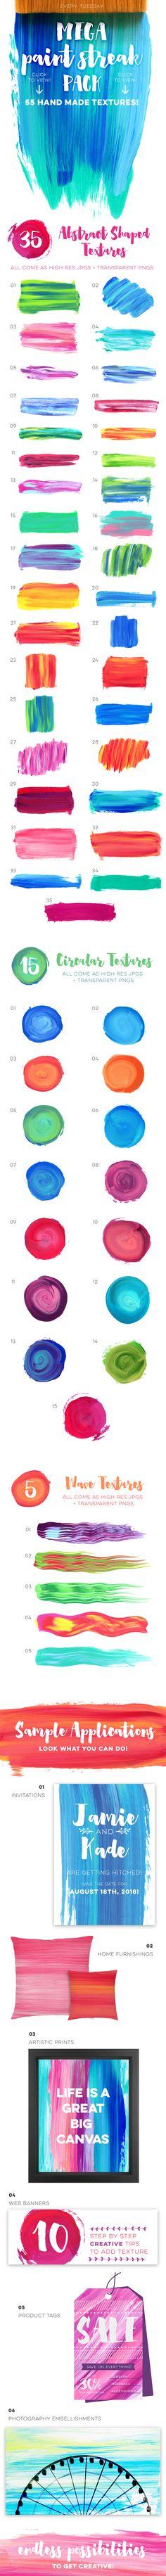 Mega Paint Streak Pack by everytuesday on Creative Market